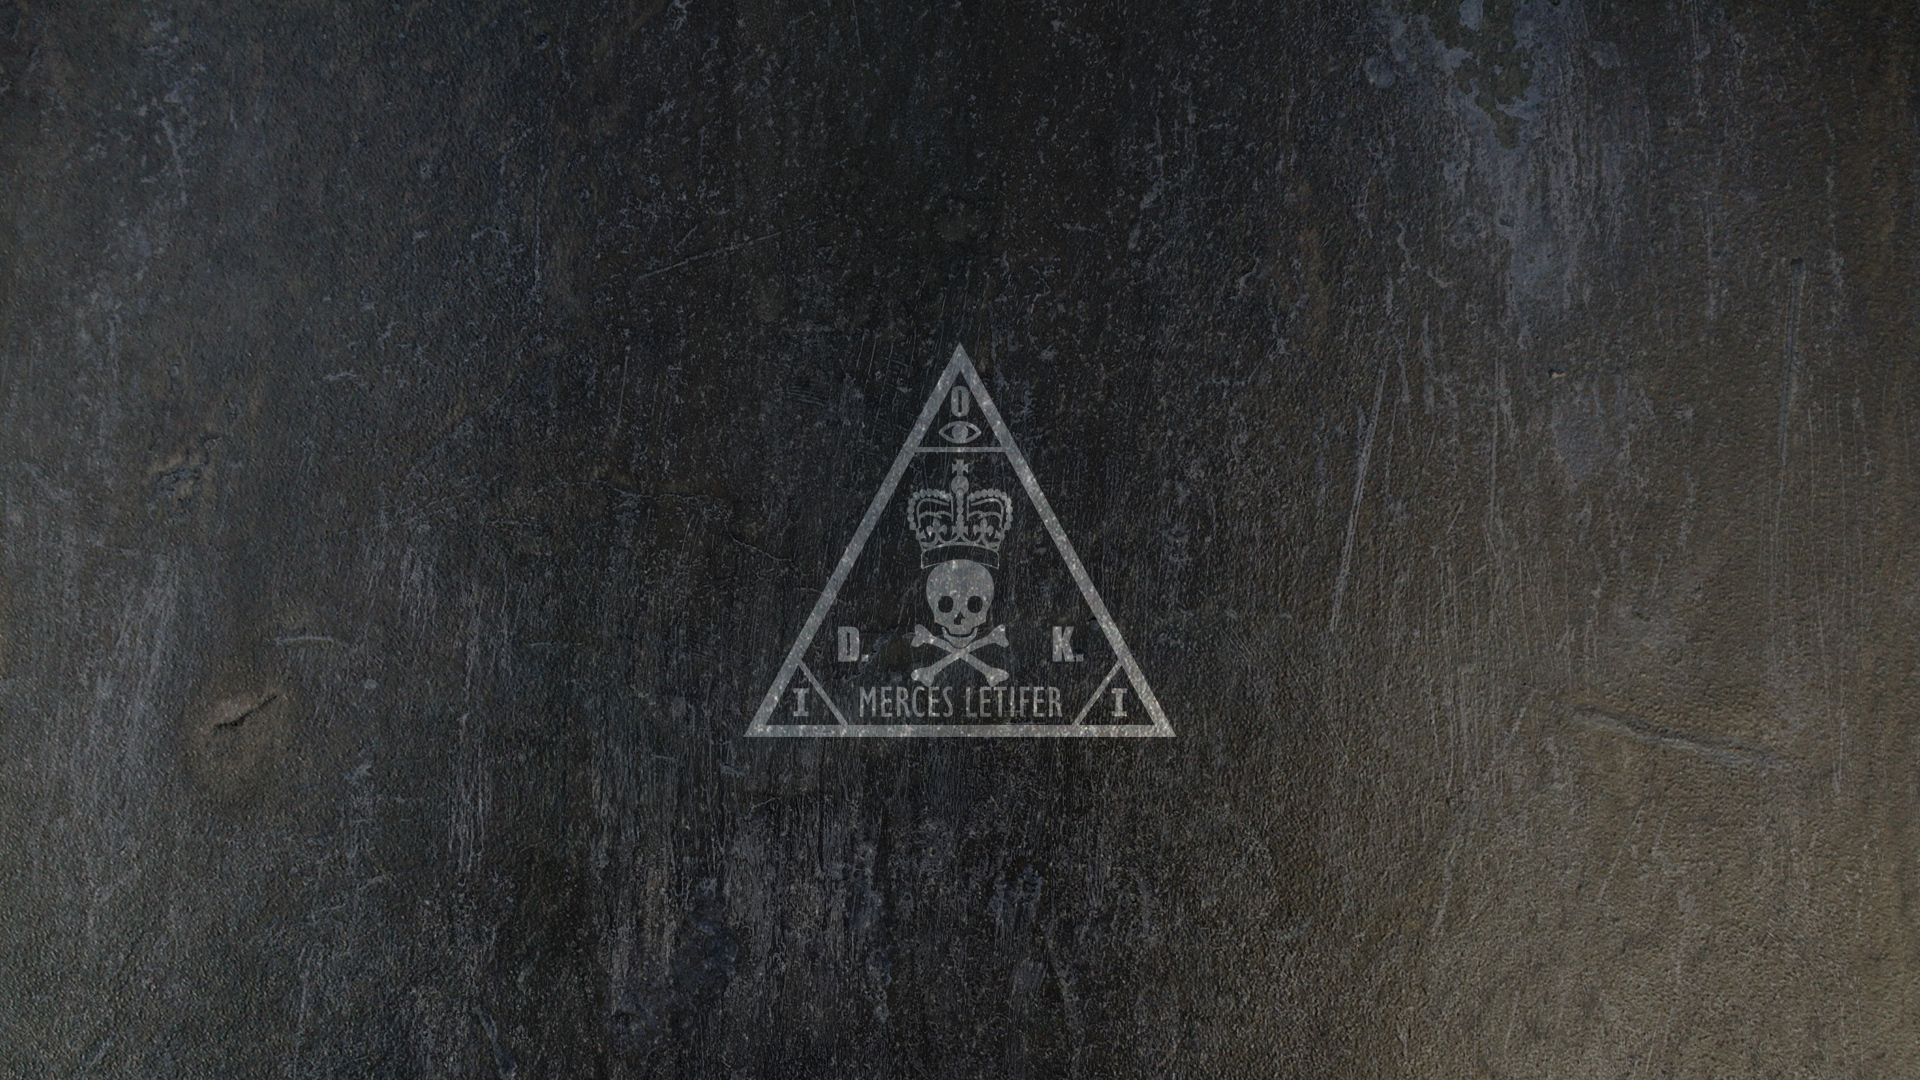 Hitman Wallpapers Vault - Hitman General Discussion - Hitmanforum